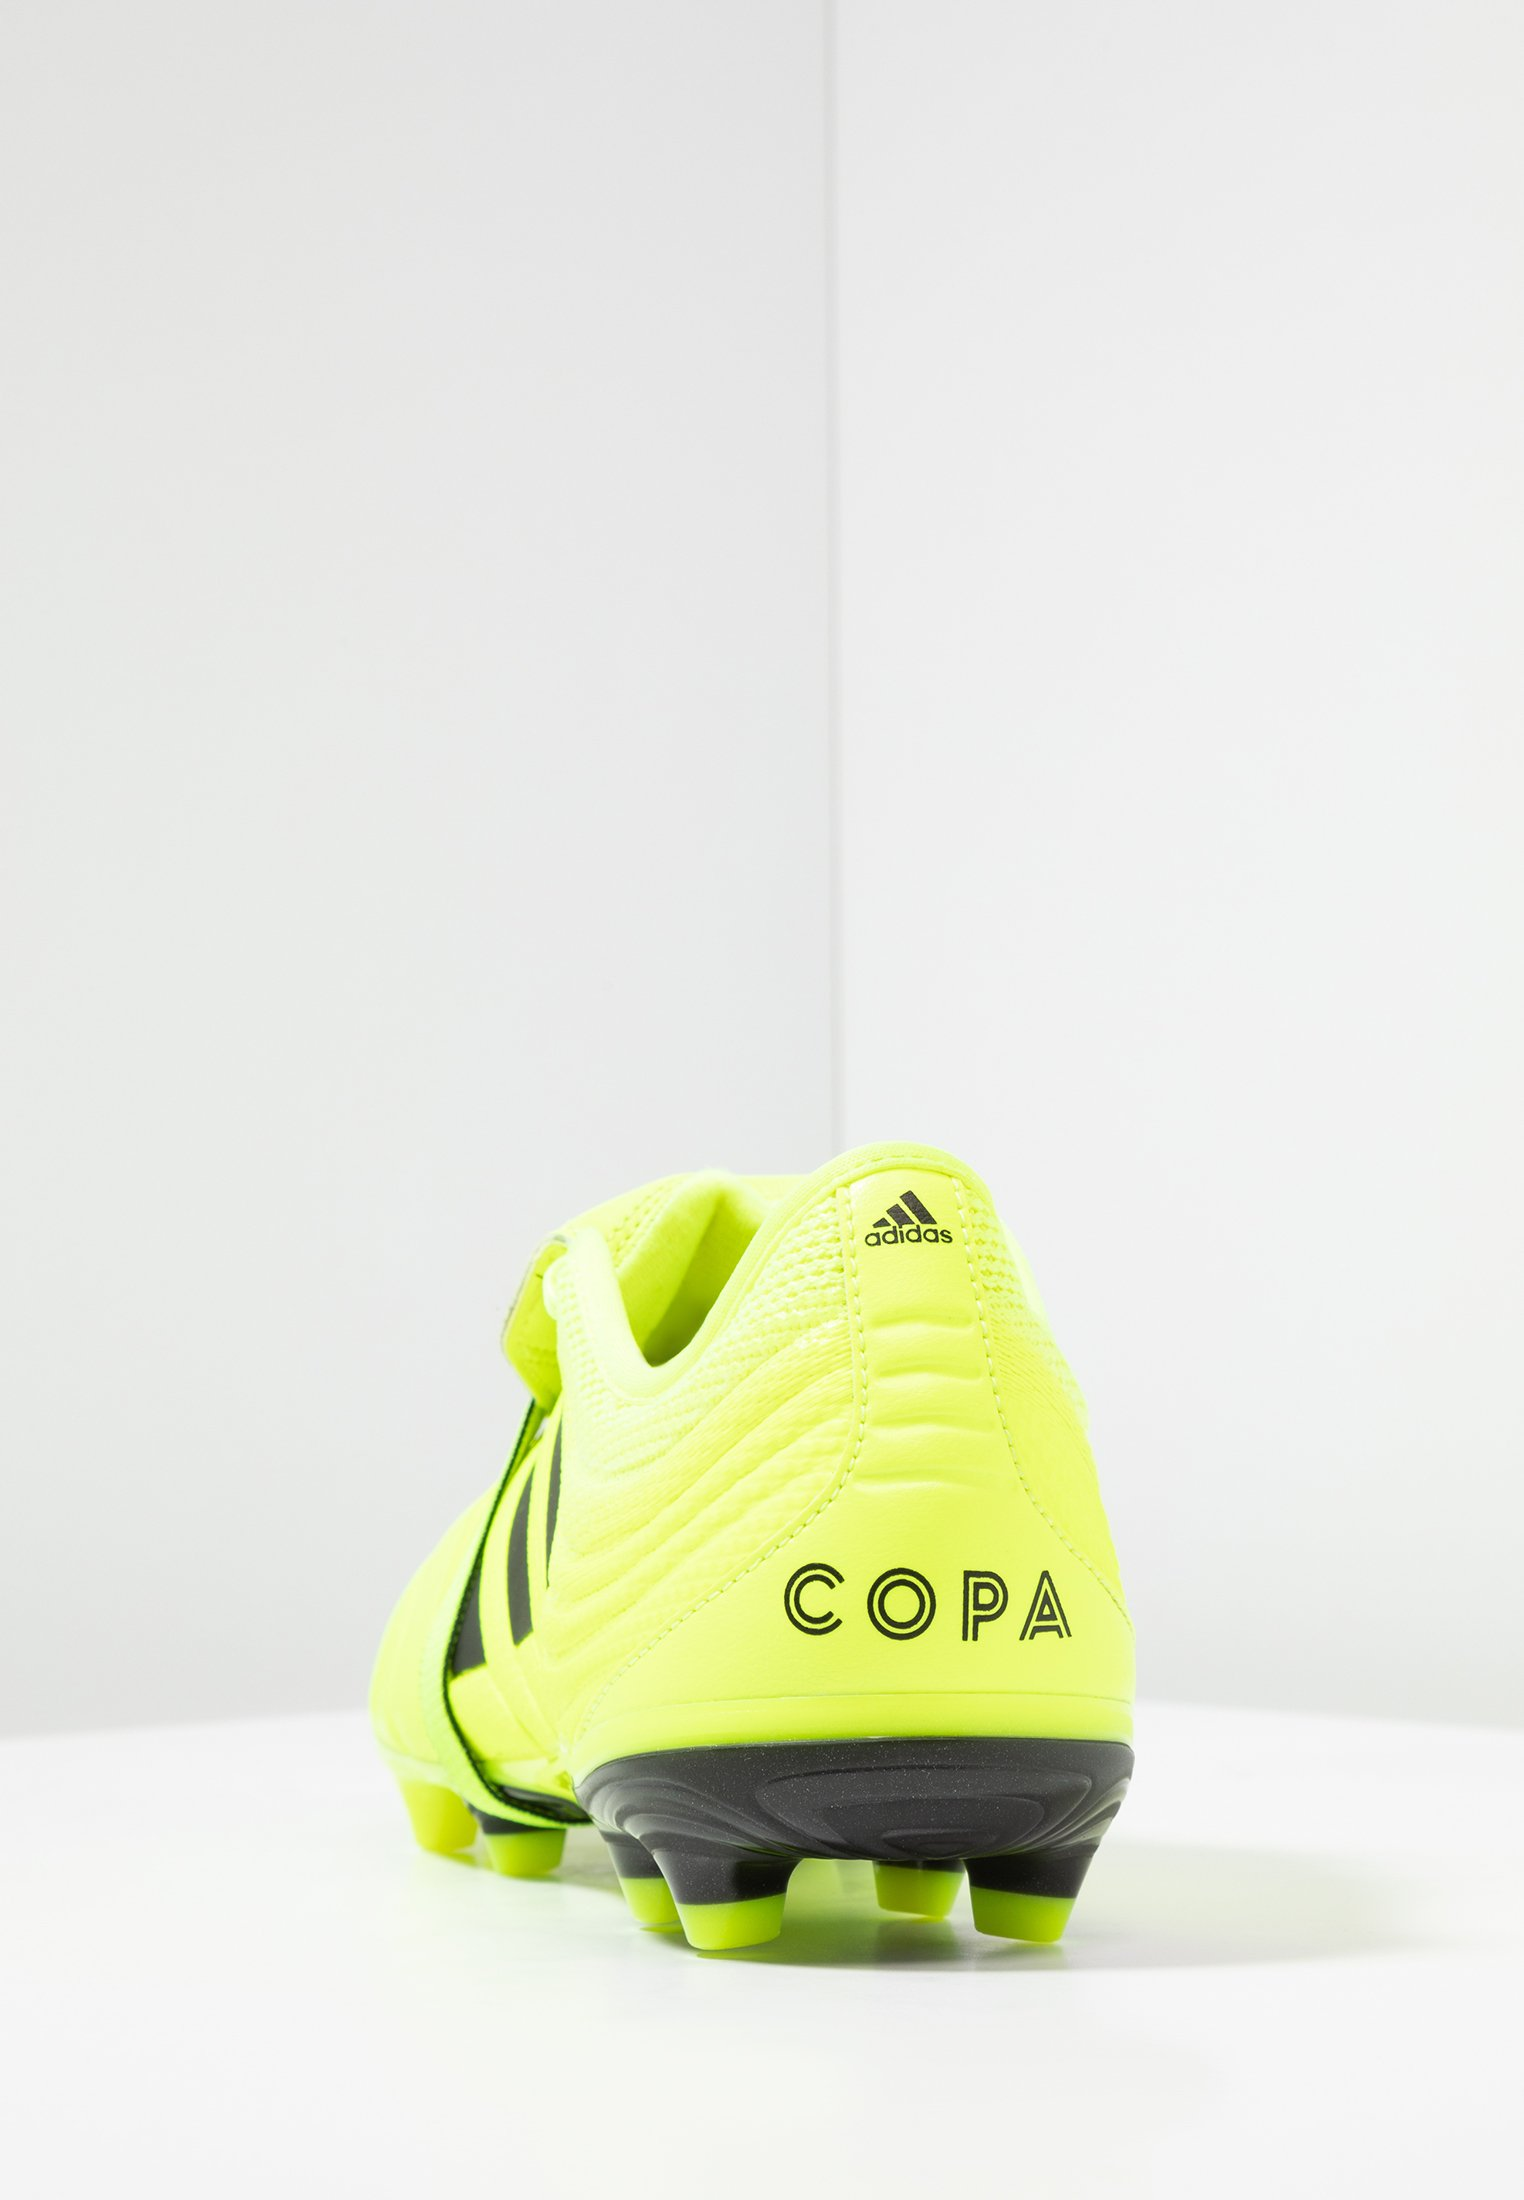 Adidas Performance Copa Gloro 19.2 Fg - Fodboldstøvler M/ Faste Knobber Solar Yellow/core Black